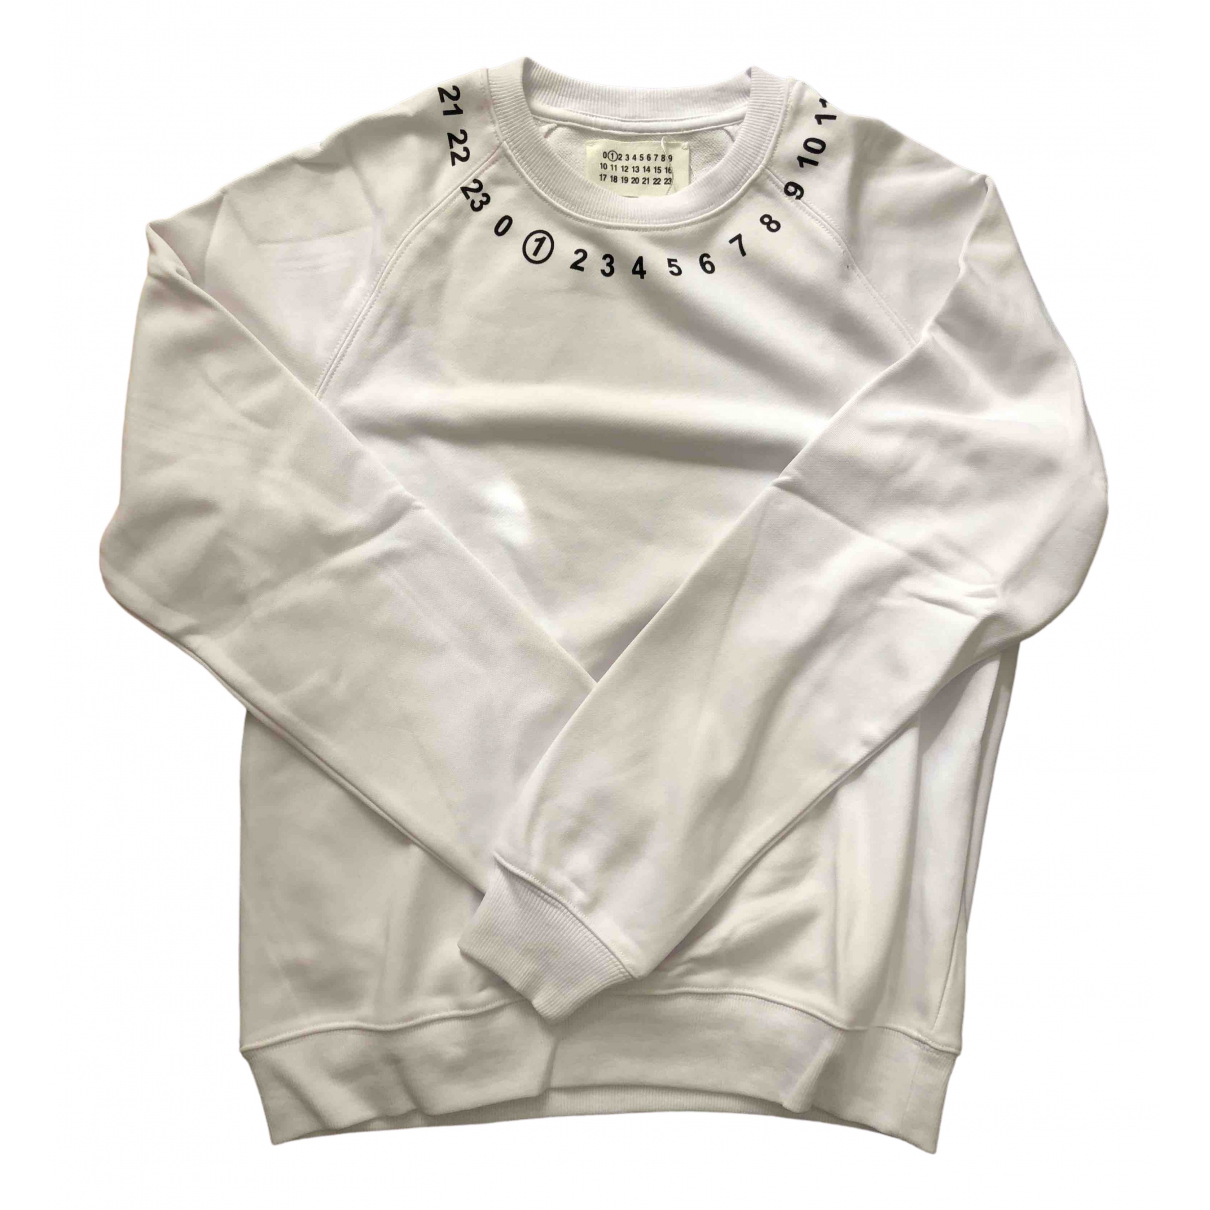 Maison Martin Margiela \N White Cotton Knitwear & Sweatshirts for Men S International